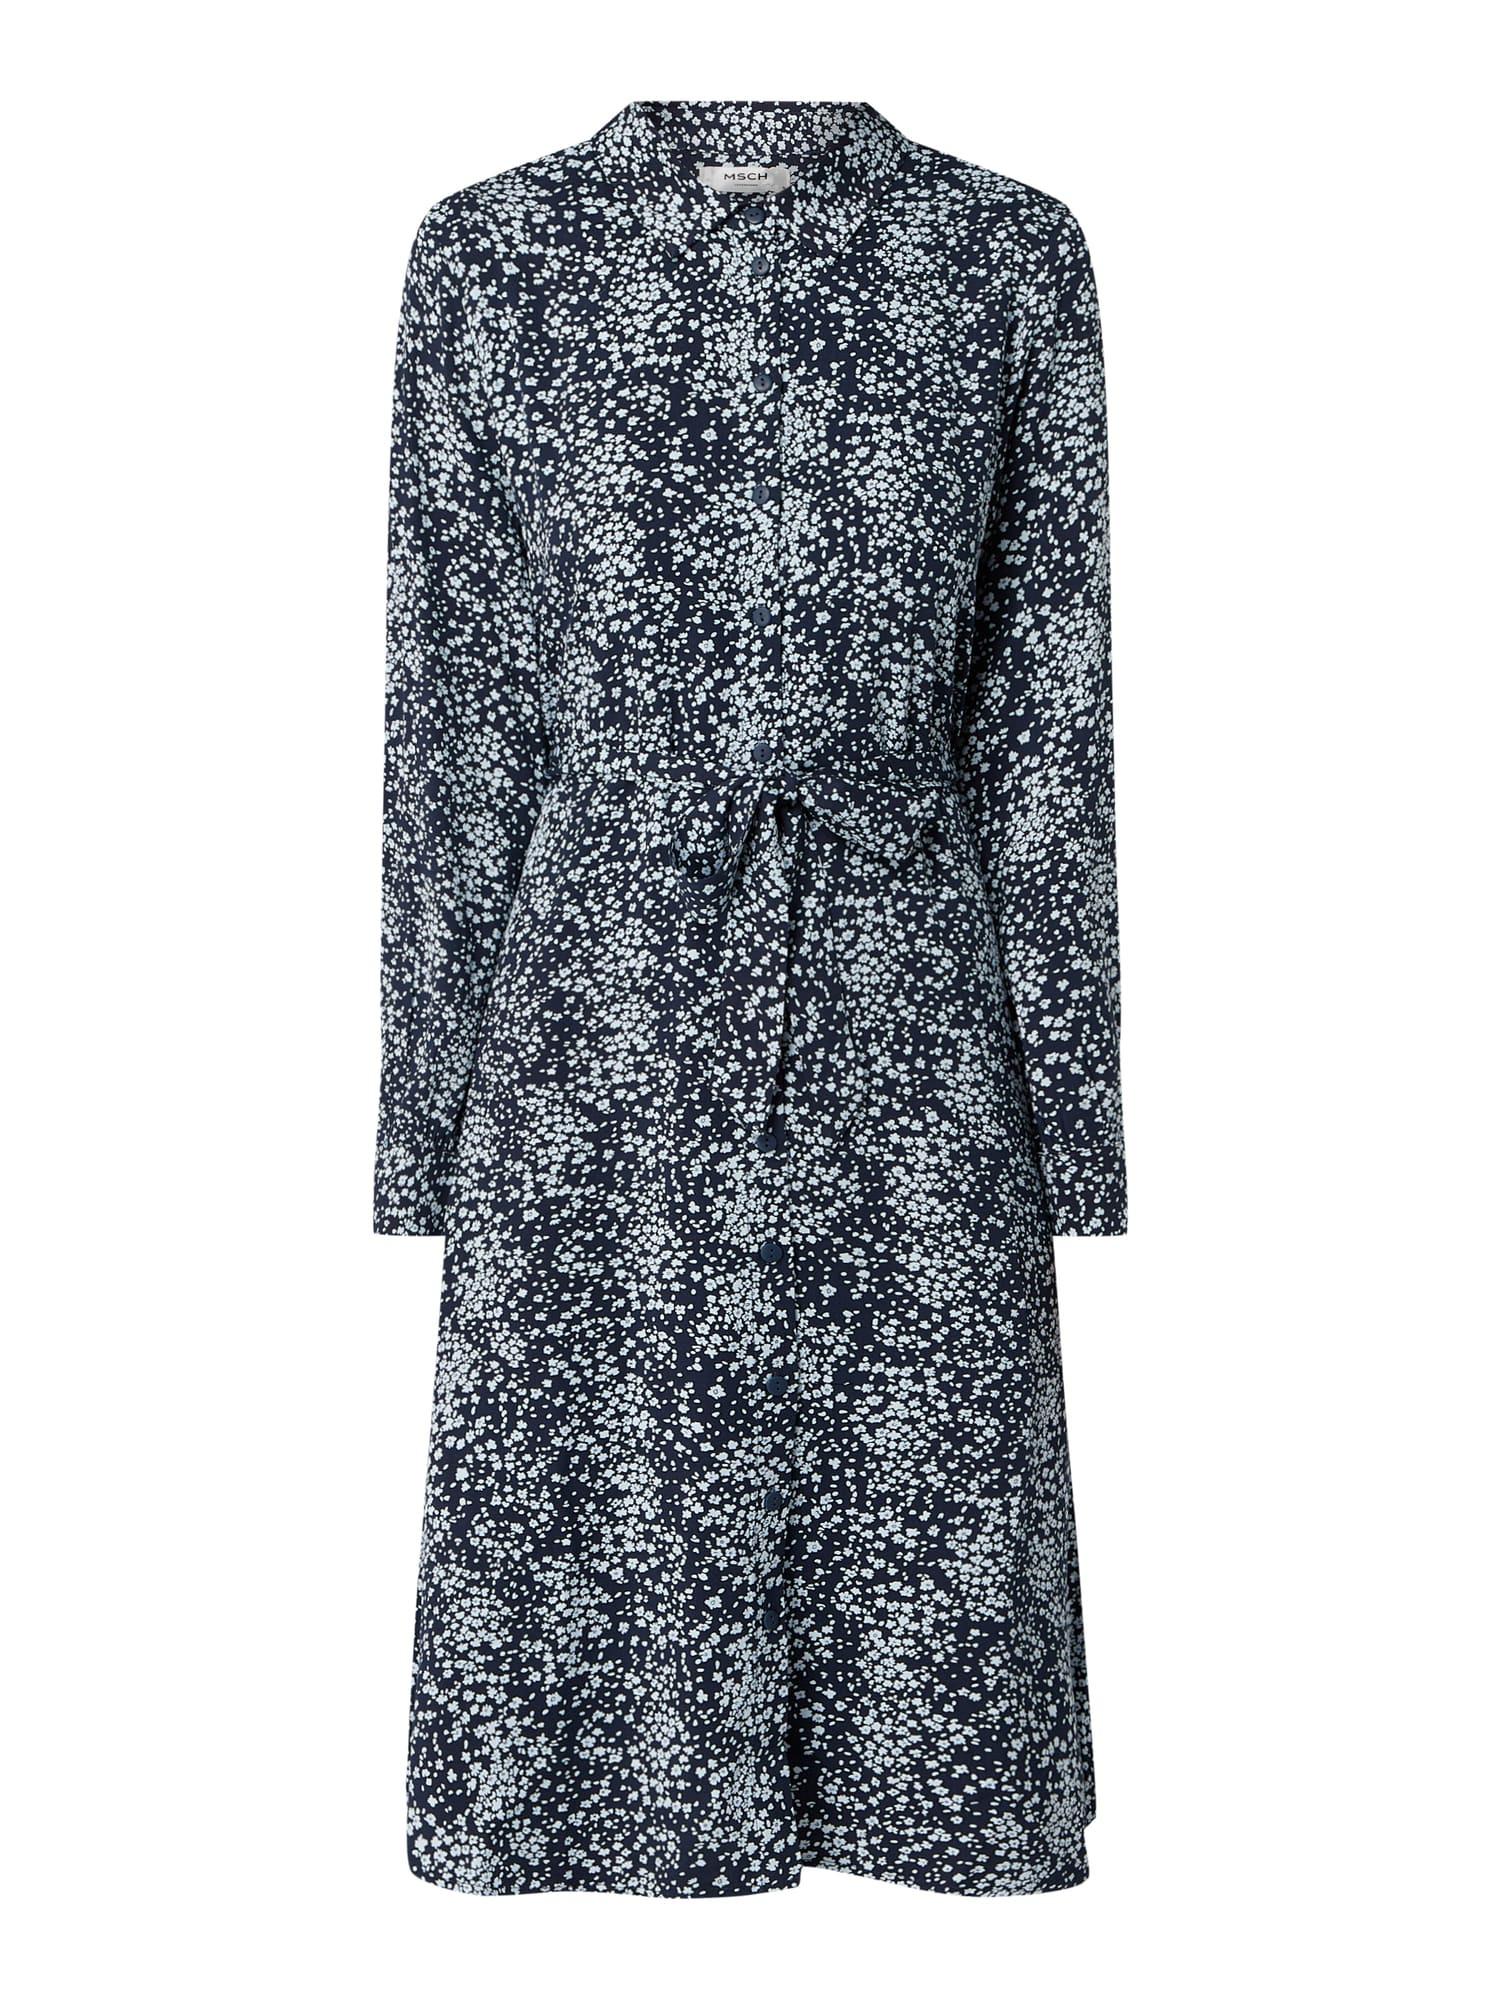 Moss Copenhagen Kleid Aus Viskose Modell 'Amaya Raye' In